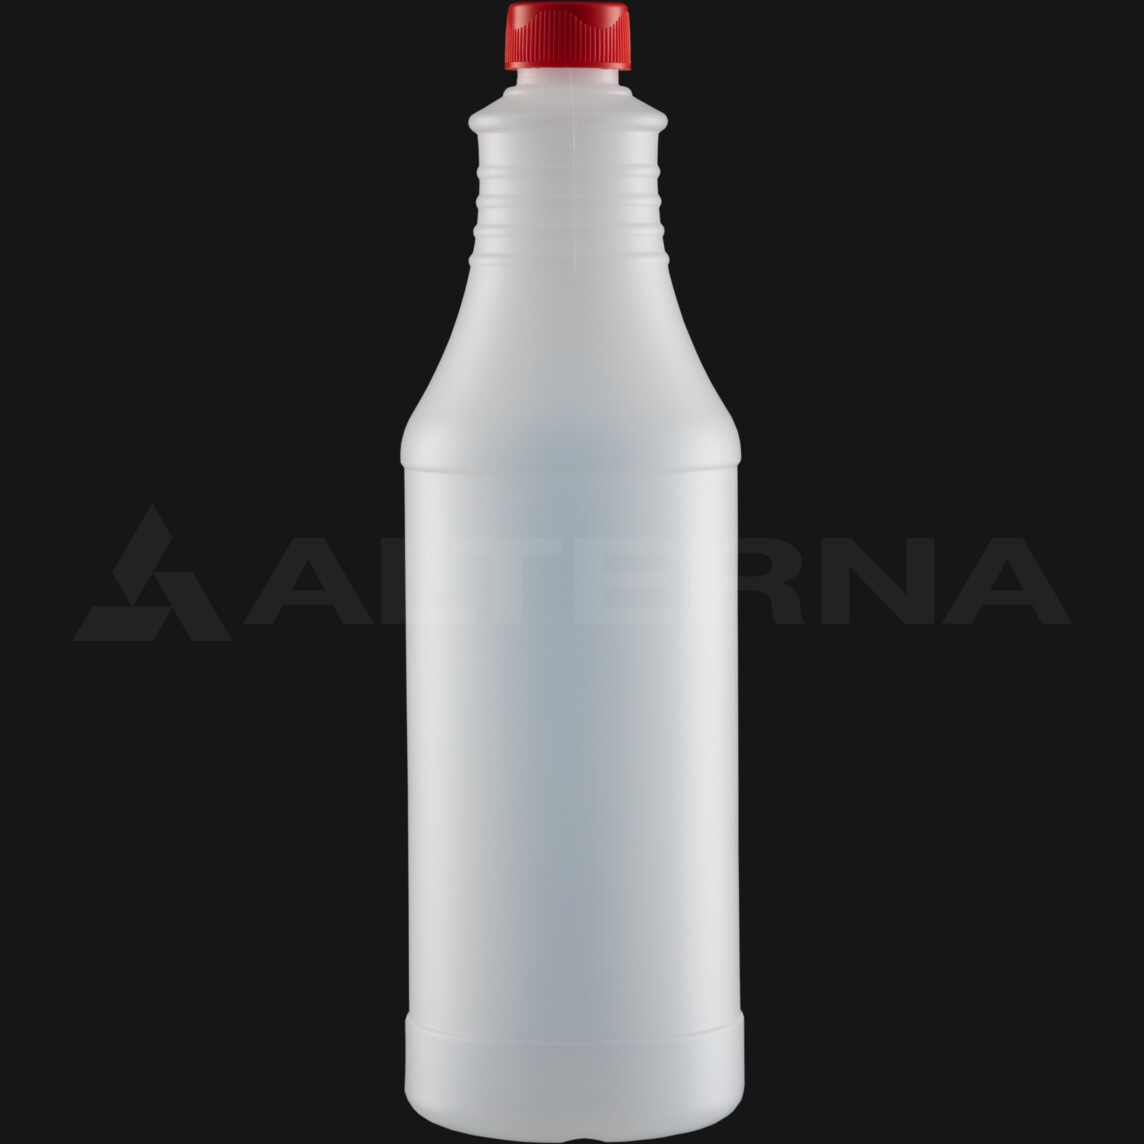 1000 ml HDPE Bottle with 28 mm Foam Seal Cap